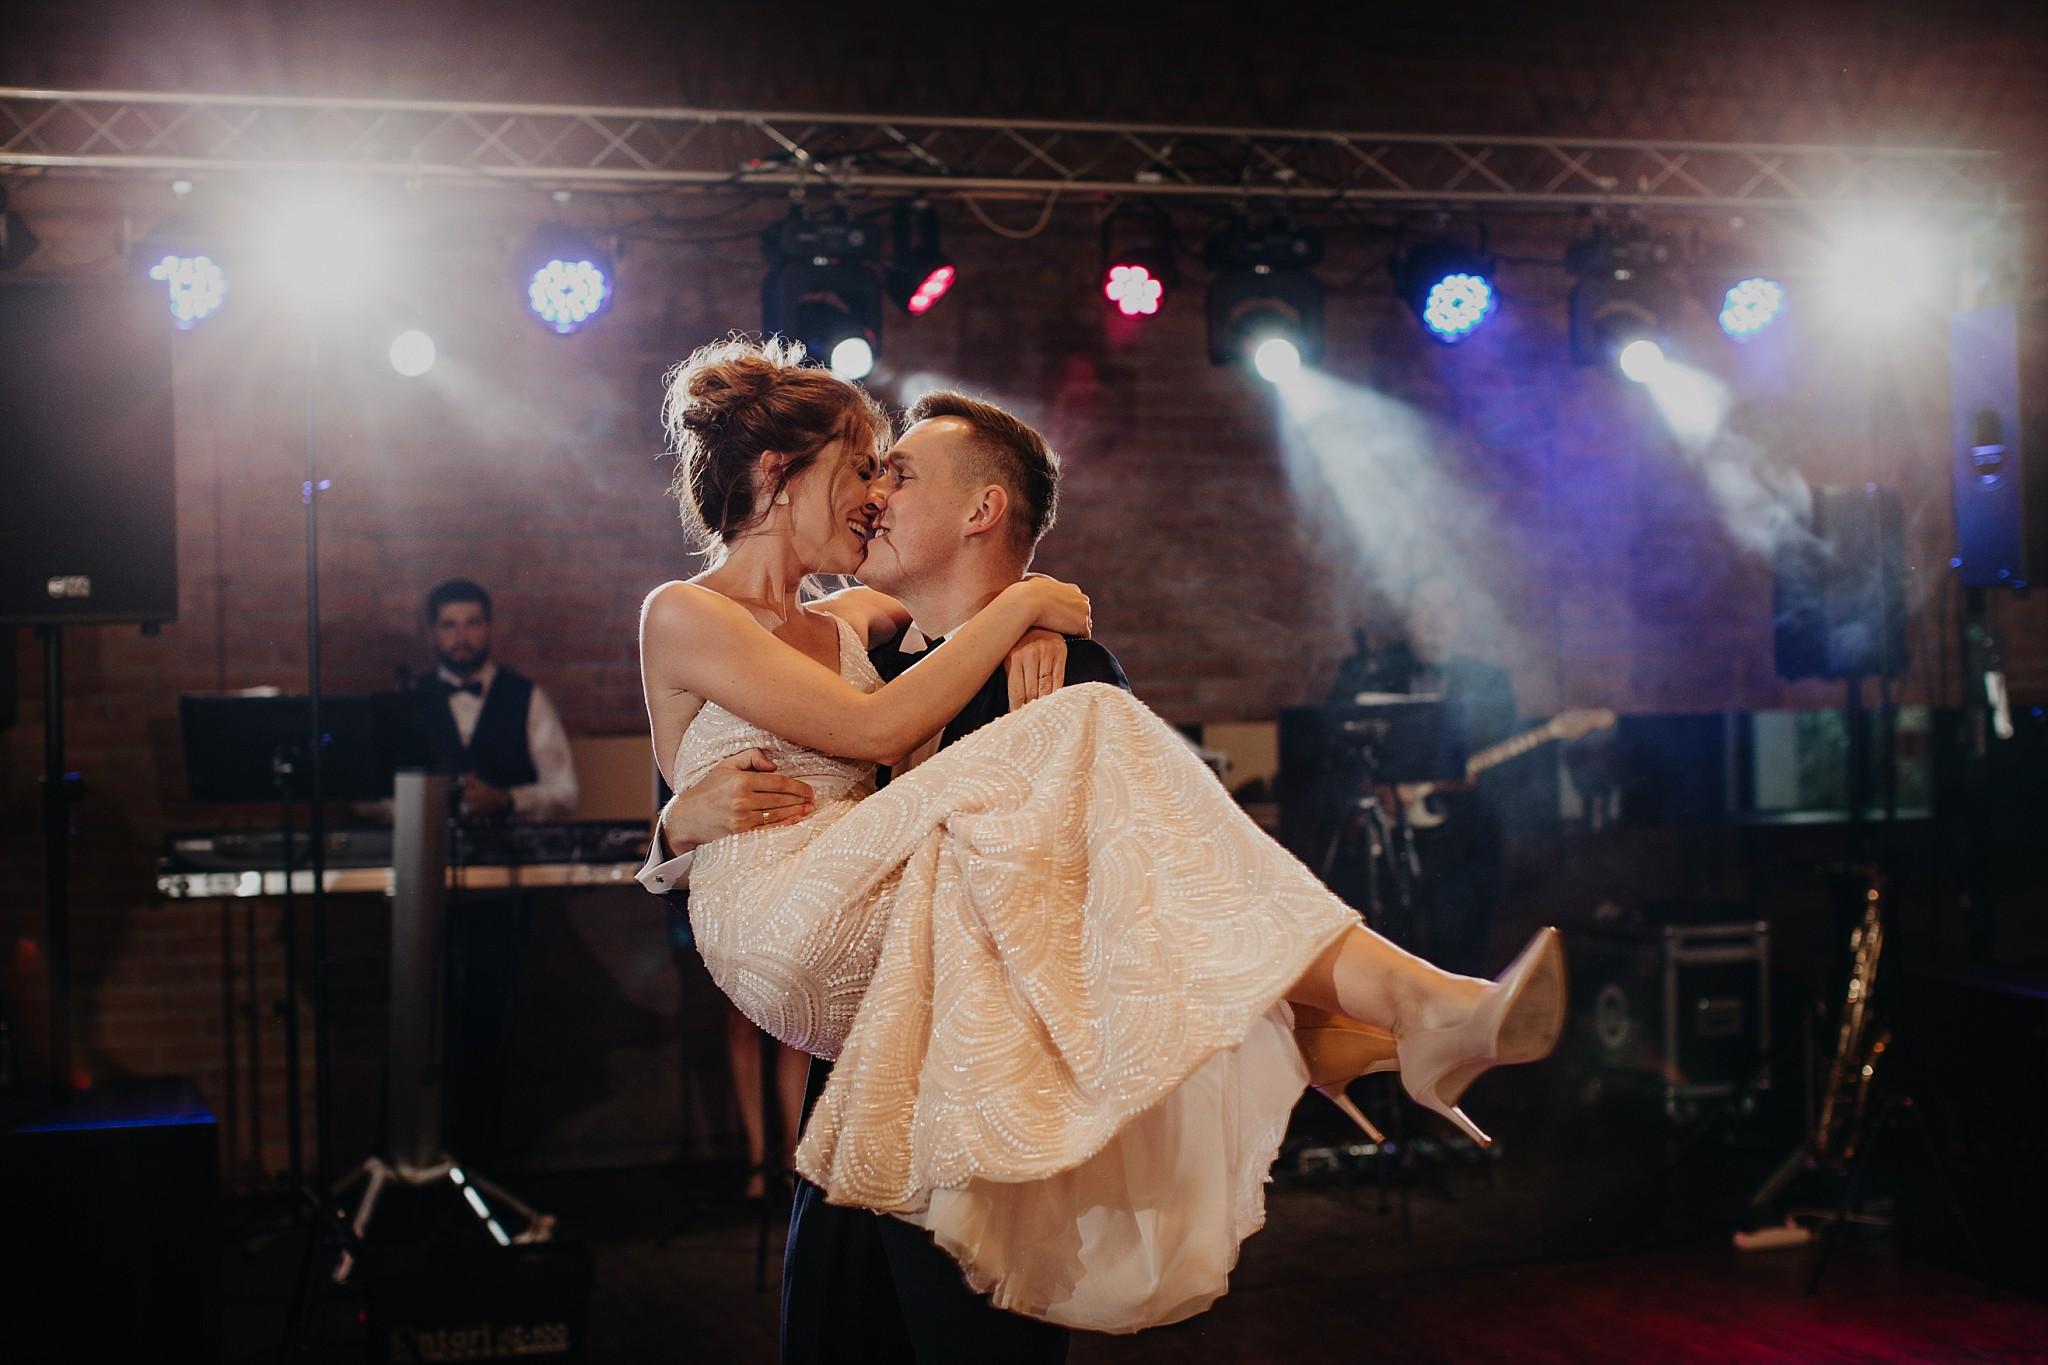 fotograf poznan wesele dobra truskawka piekne wesele pod poznaniem wesele w dobrej truskawce piekna para mloda slub marzen slub koronawirus slub listopad wesele koronawirus 323